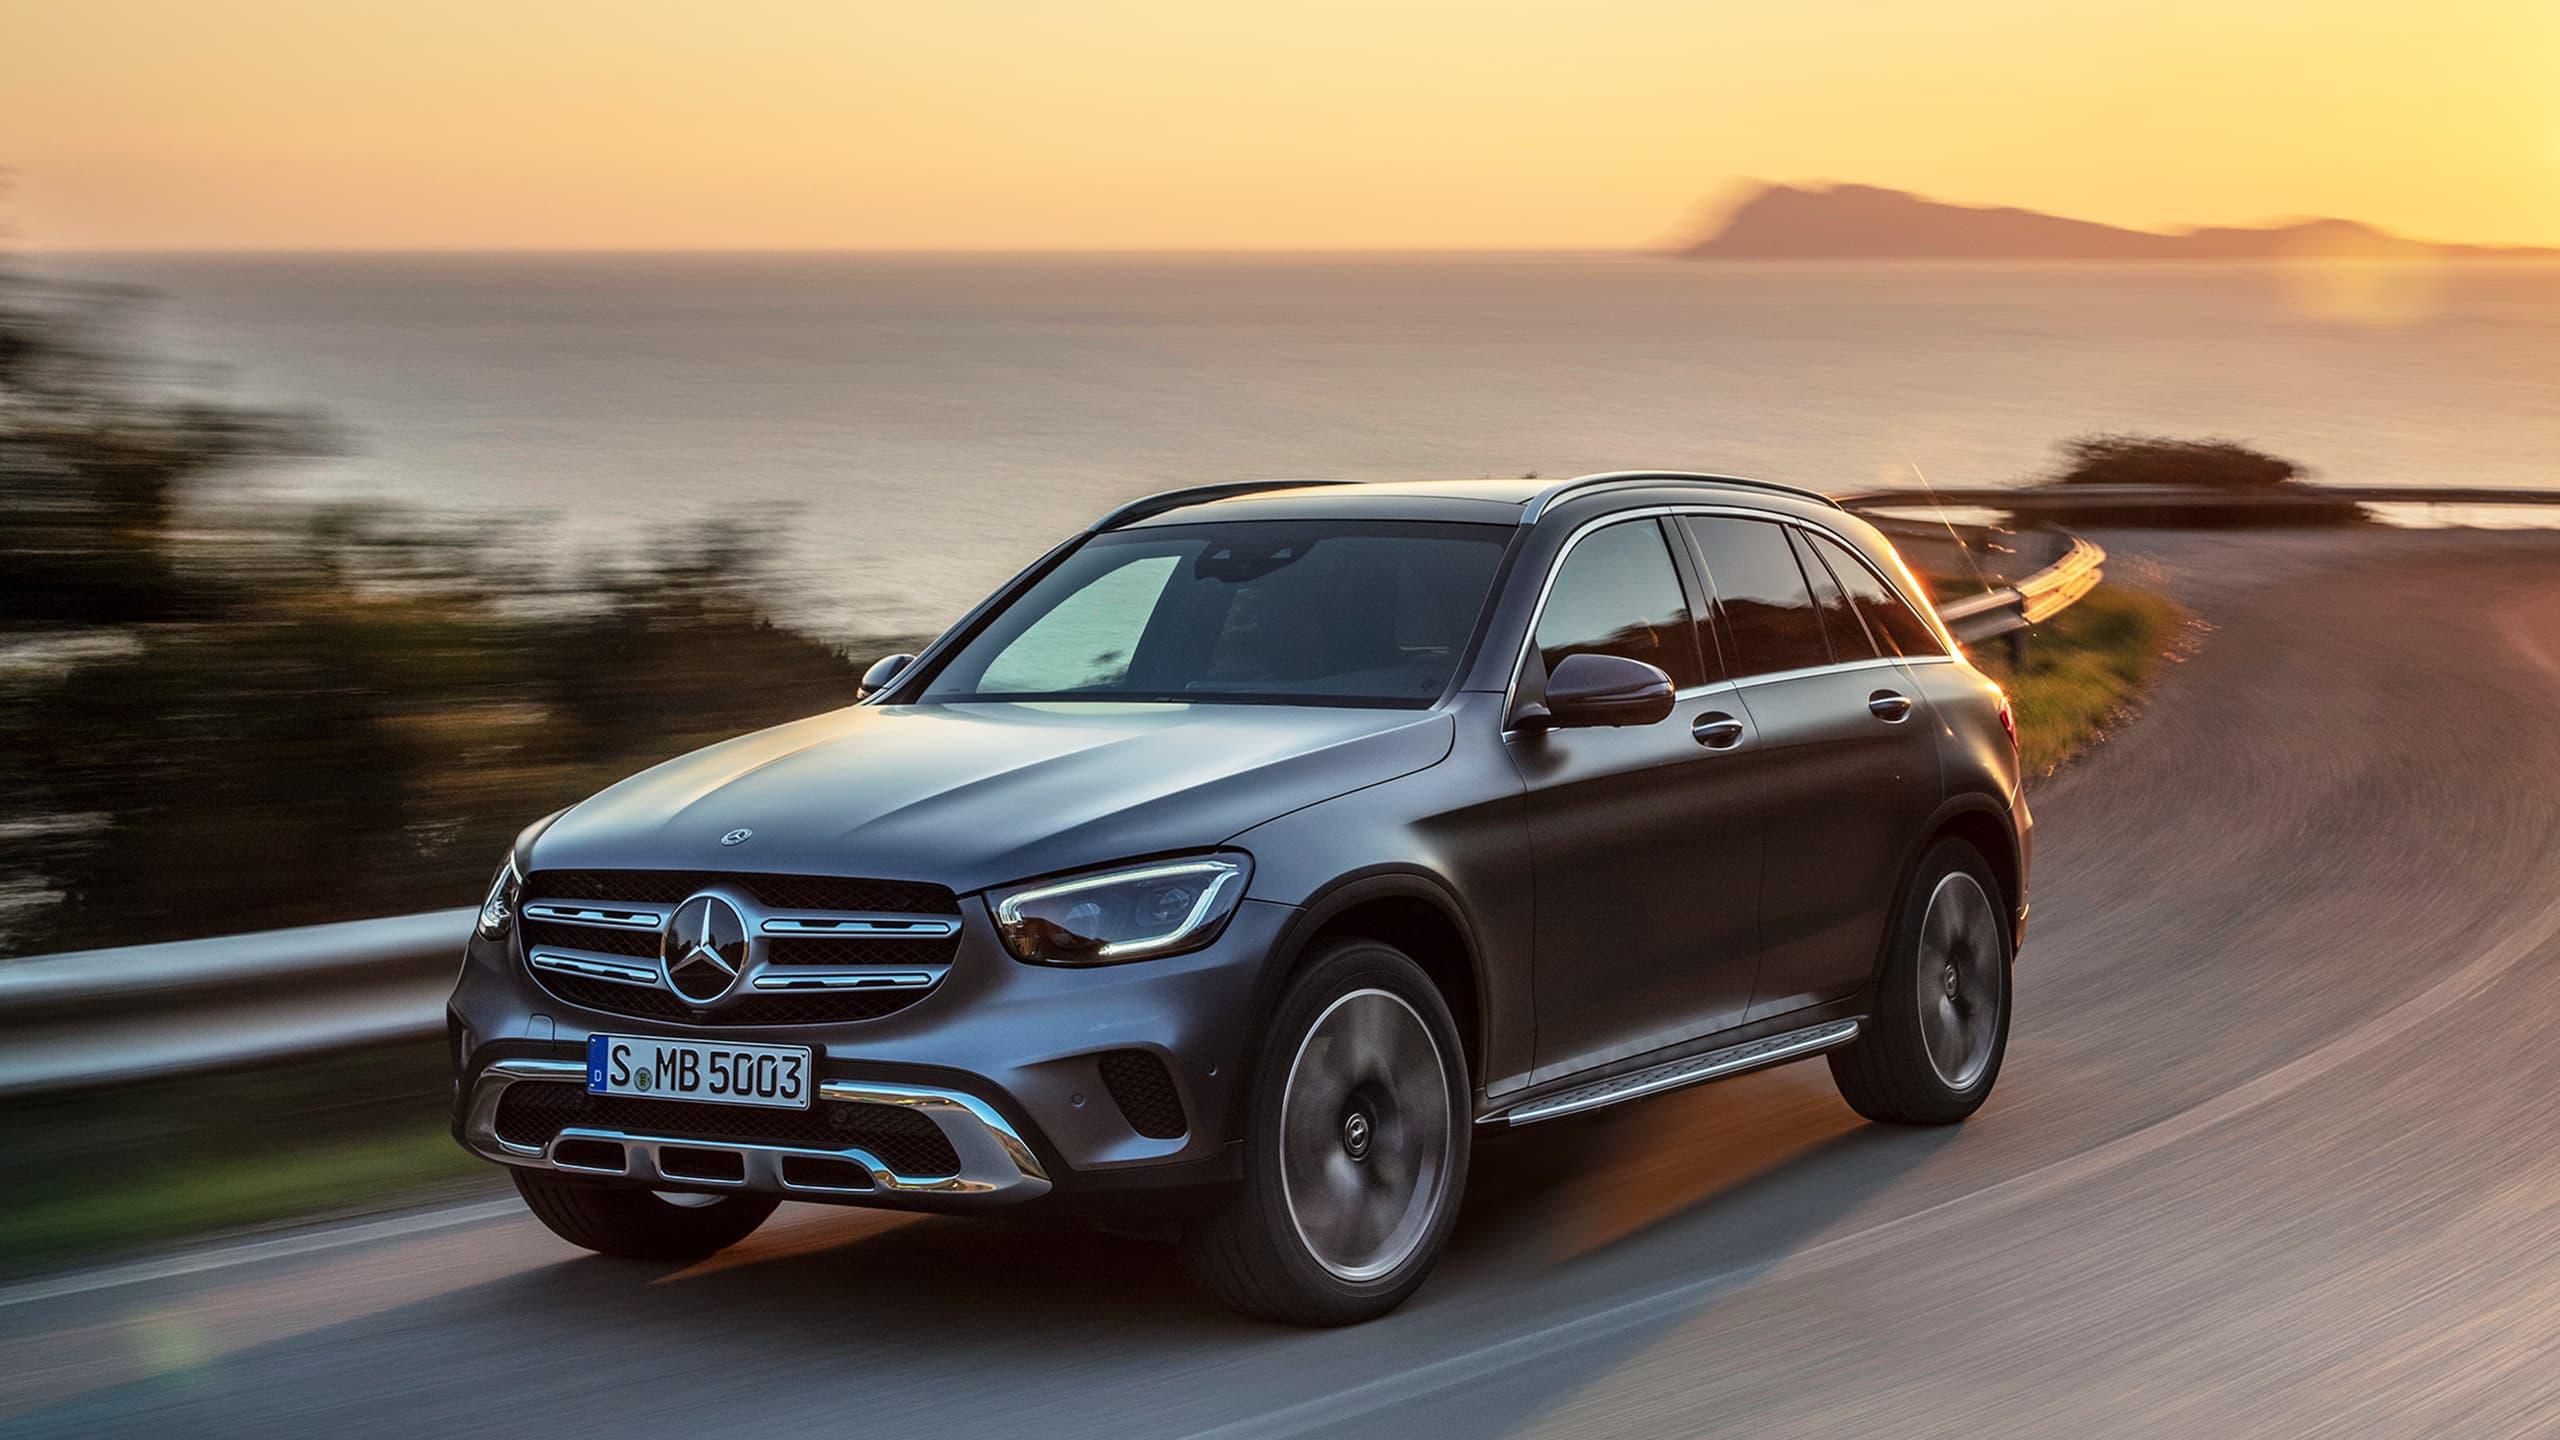 Giá xe Mercedes GLC Class